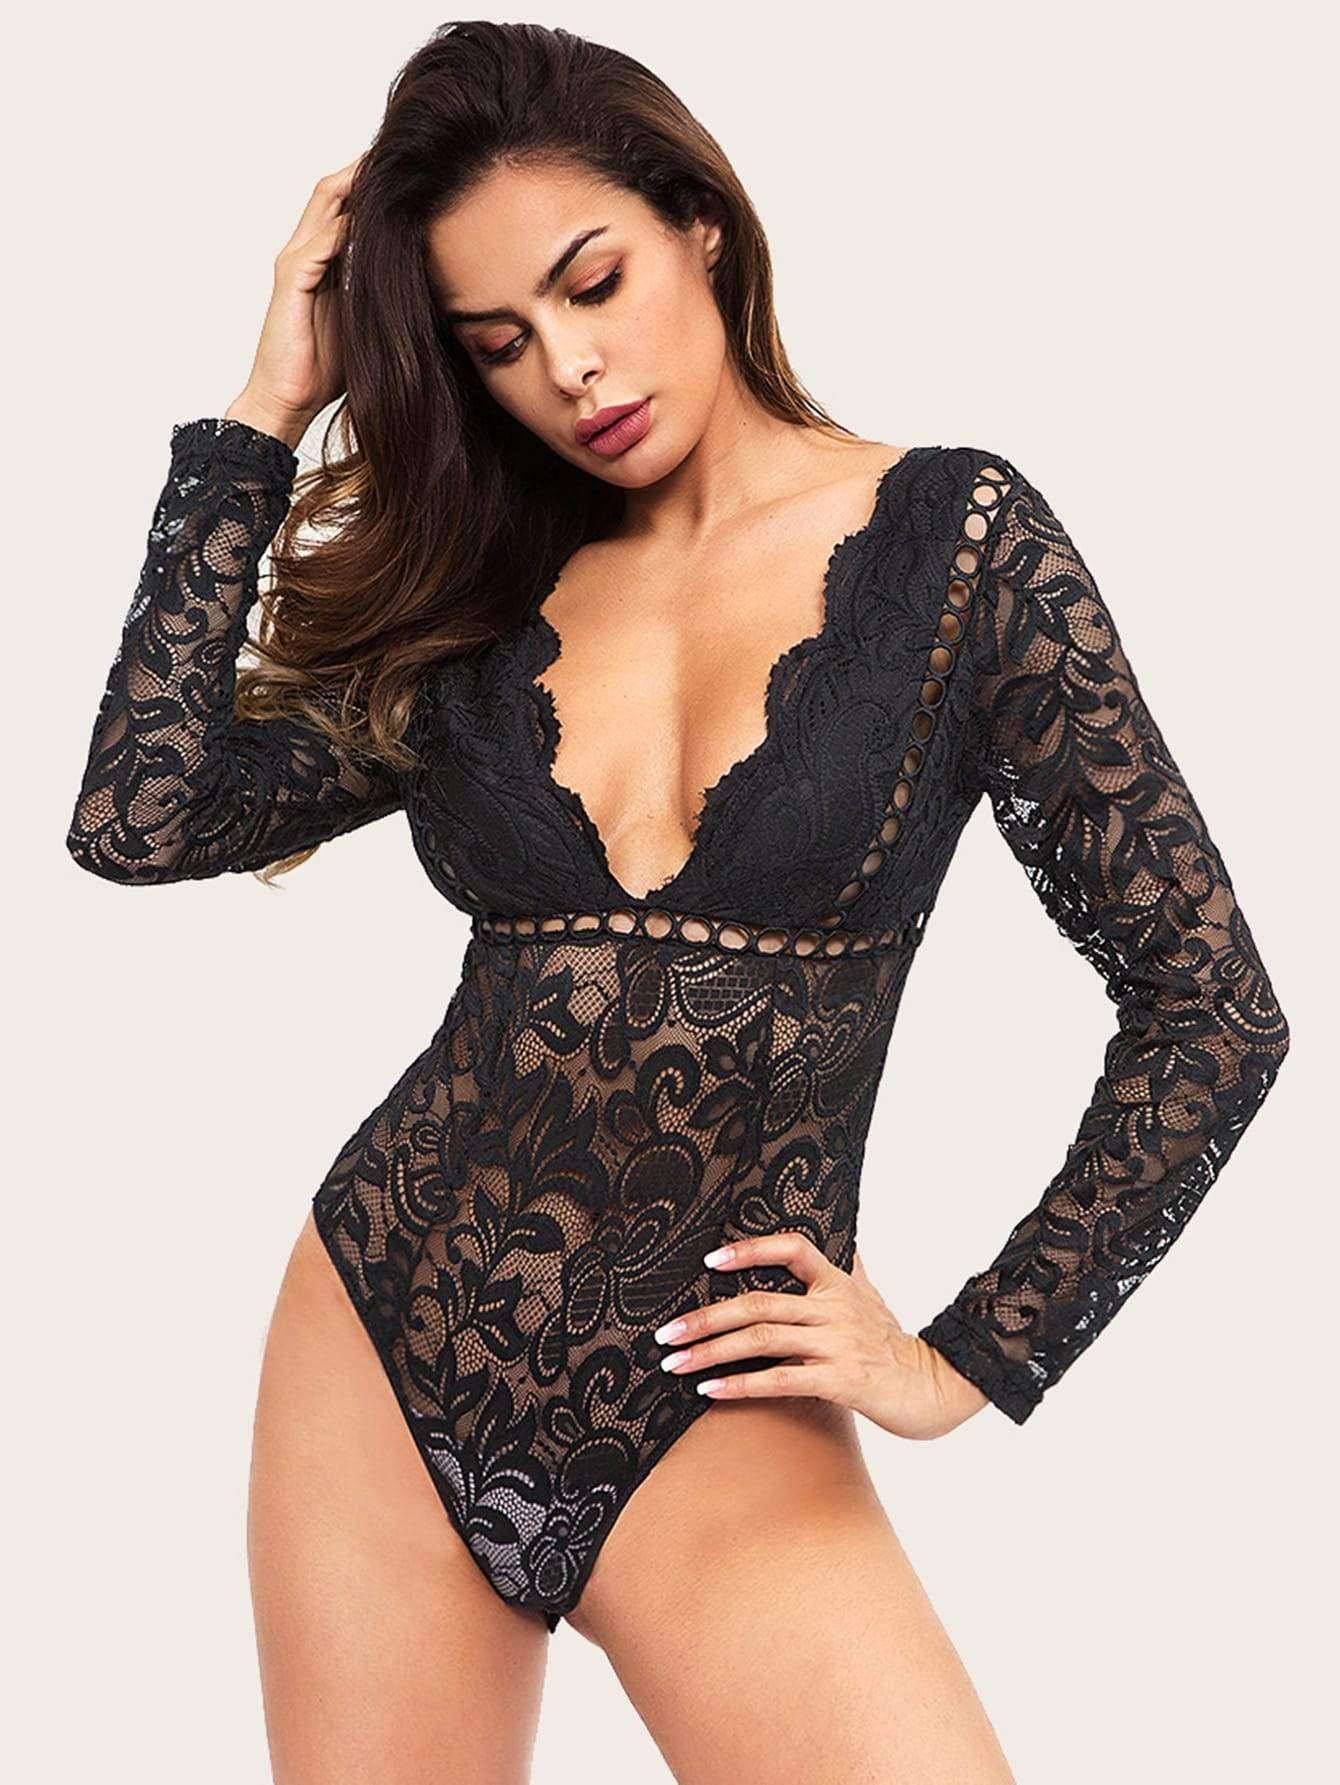 824b7227bc Lace Cut Out Deep V Neck Bodysuit - Popviva #bodysuits #rompersuit  #toreadorpants #suspenderbelt #bras #corset #tights #swimsuits #lycra  #spandex ...